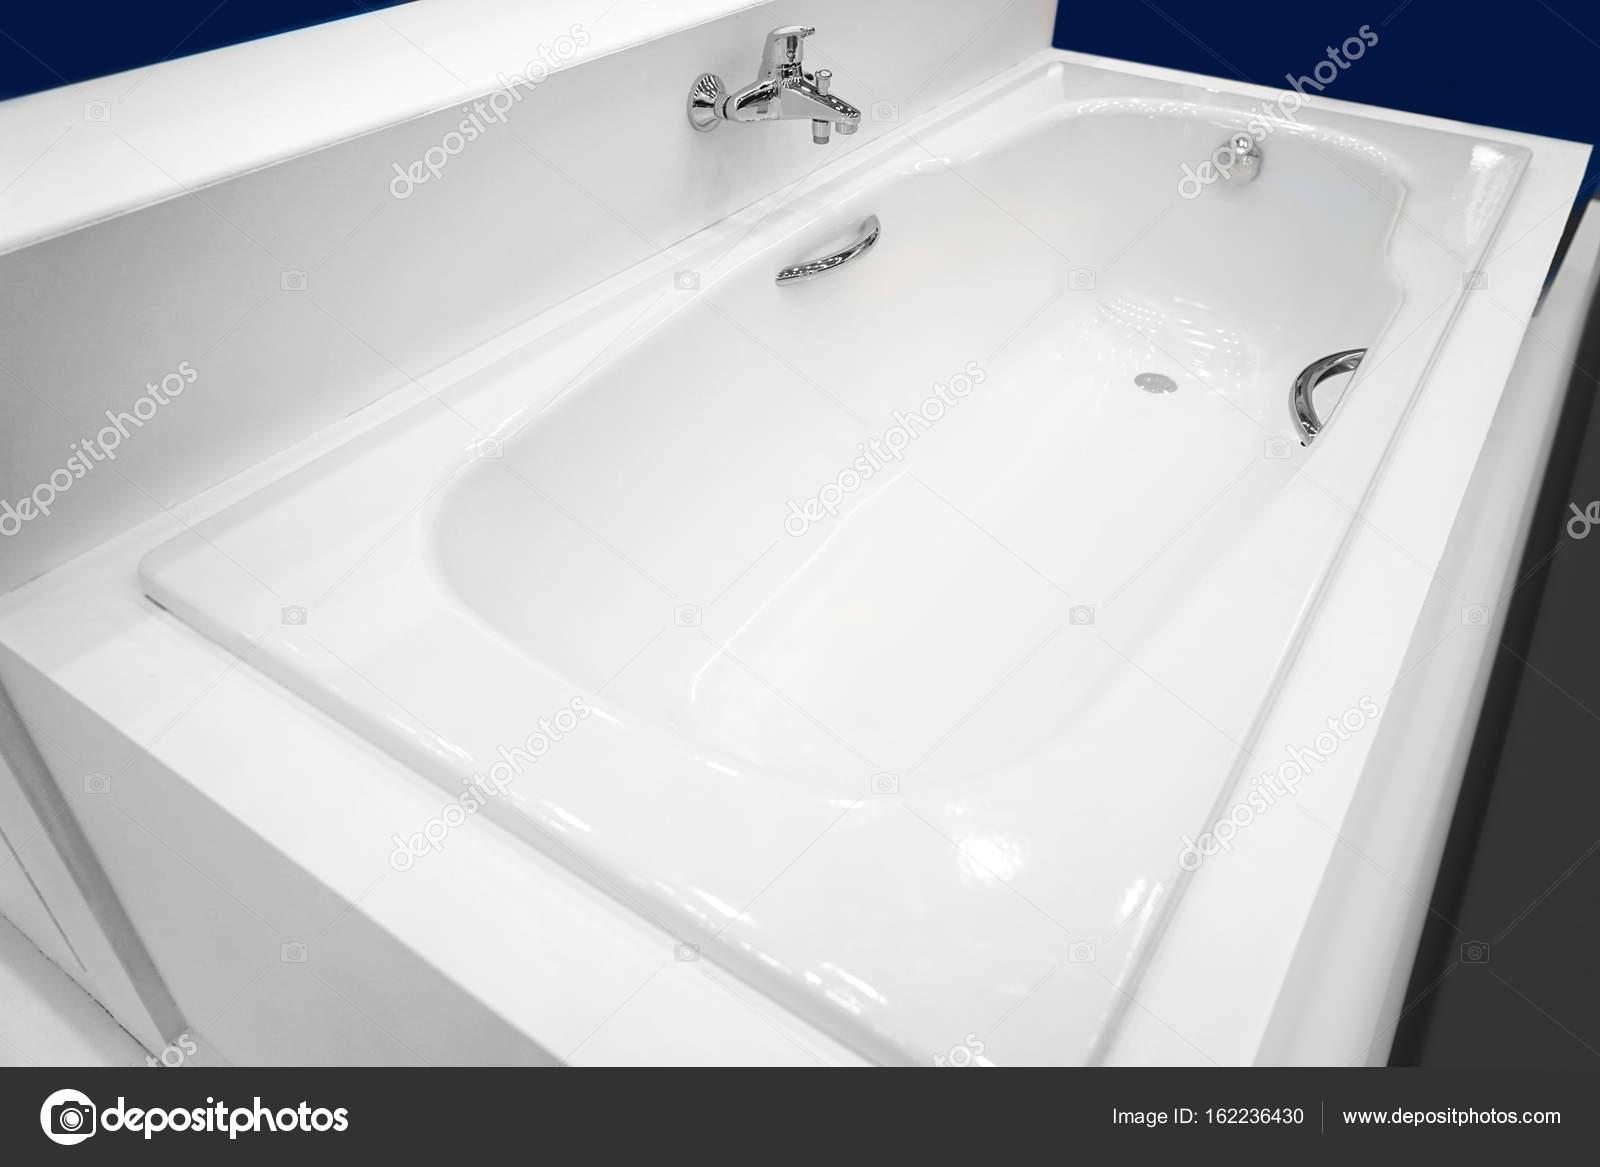 Vasca Da Bagno Nuova : Vasca da bagno nuova moderna u2014 foto stock © belchonock #162236430